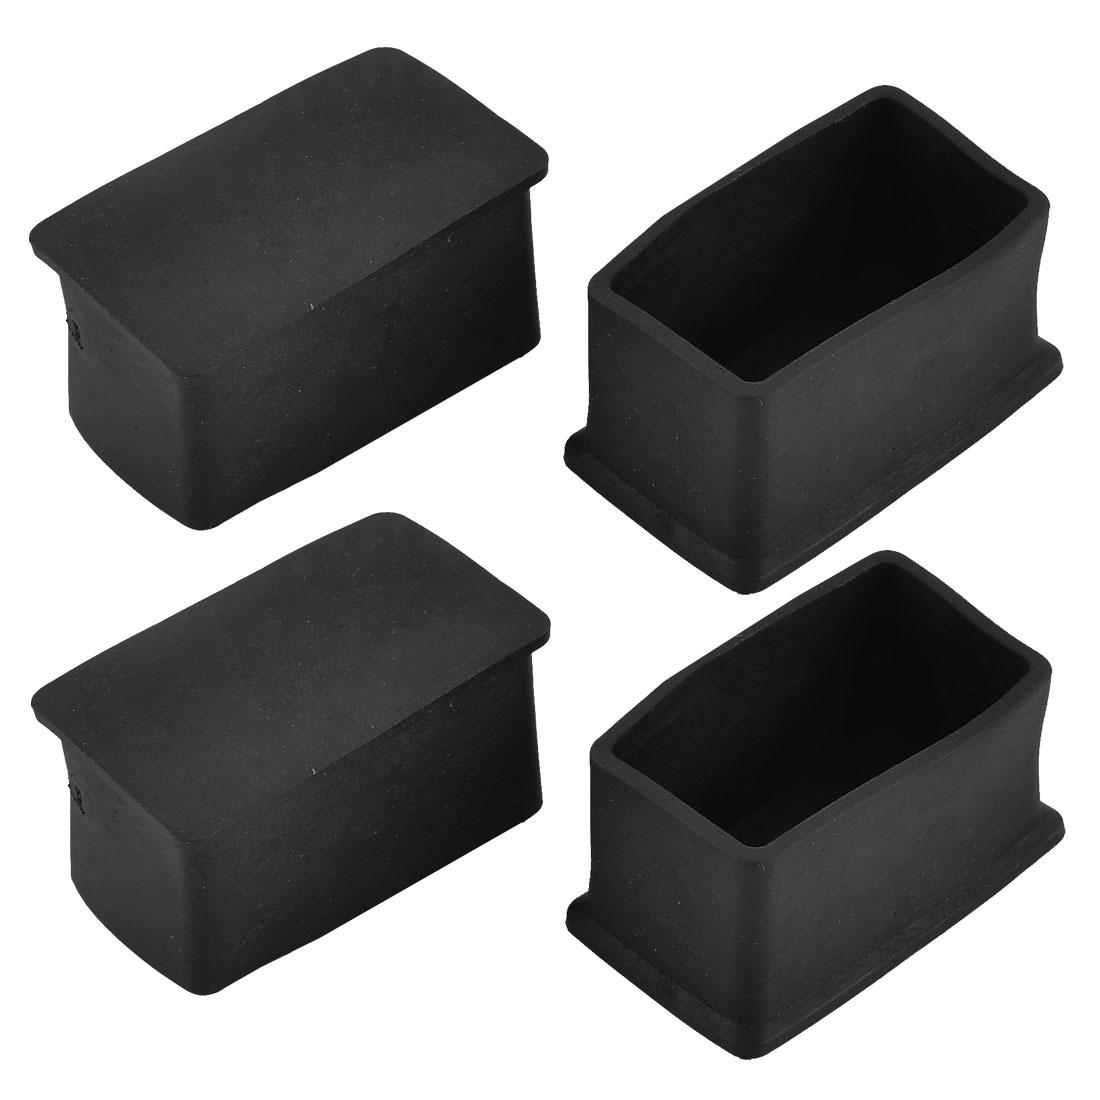 47mm x 25mm Rectangle Shaped Furniture Foot Leg Rubber End Caps Cover Black 4pcs